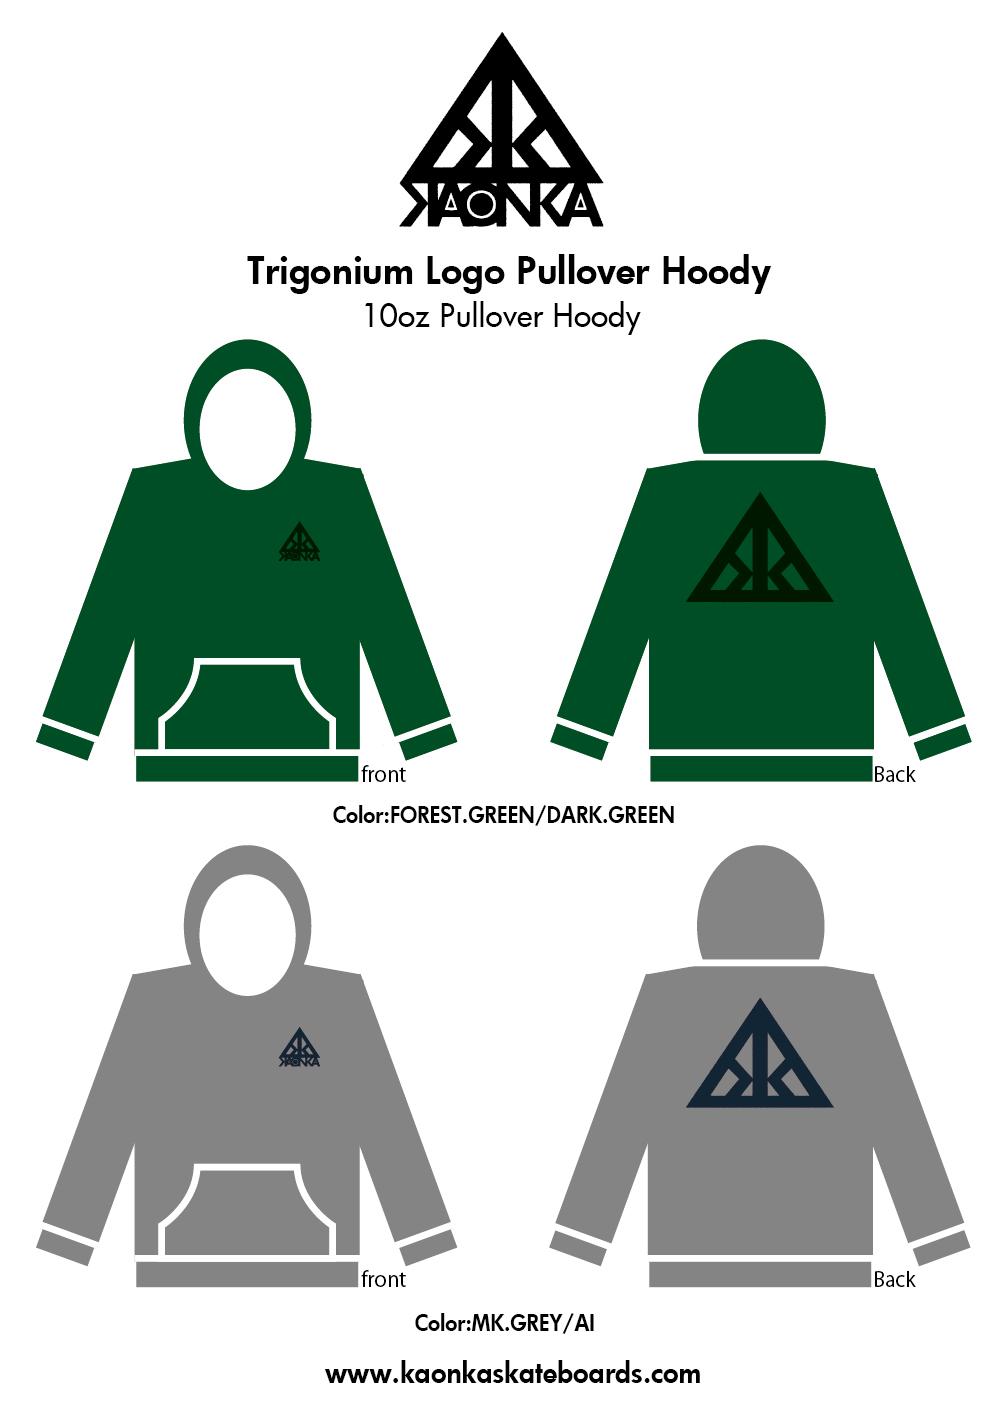 KAONKA-15FW-pulloverhood-Trigologo-pop.jpg